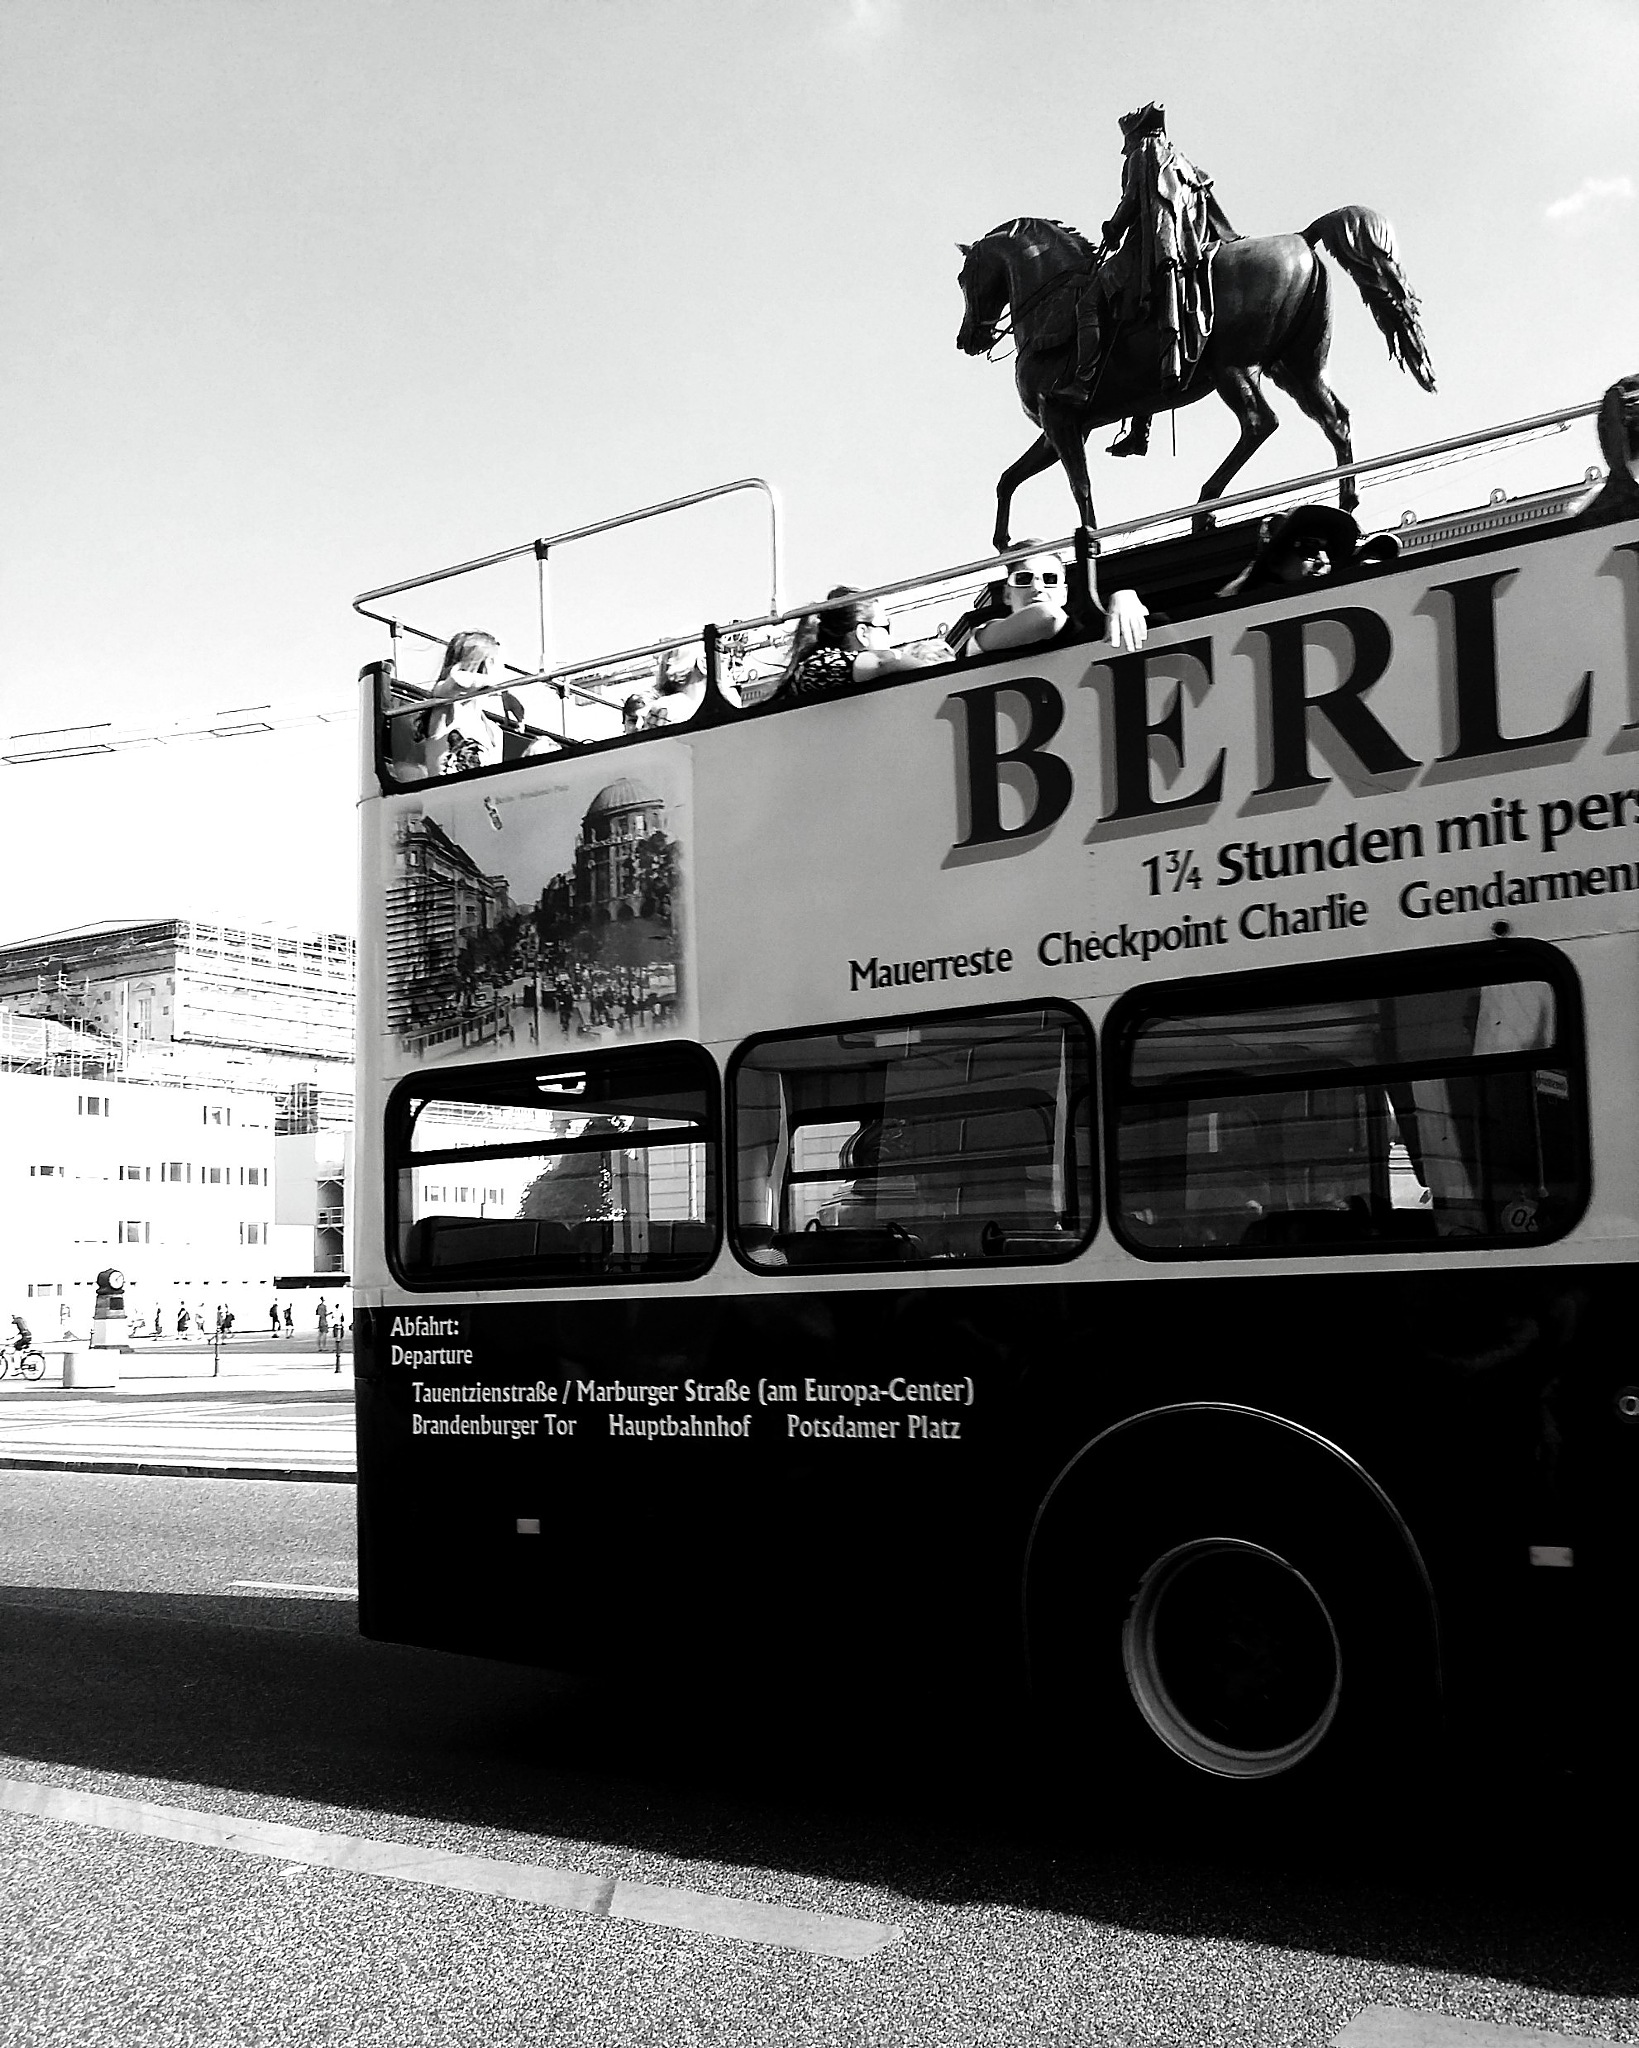 Horse on the Bus. by kookieshot